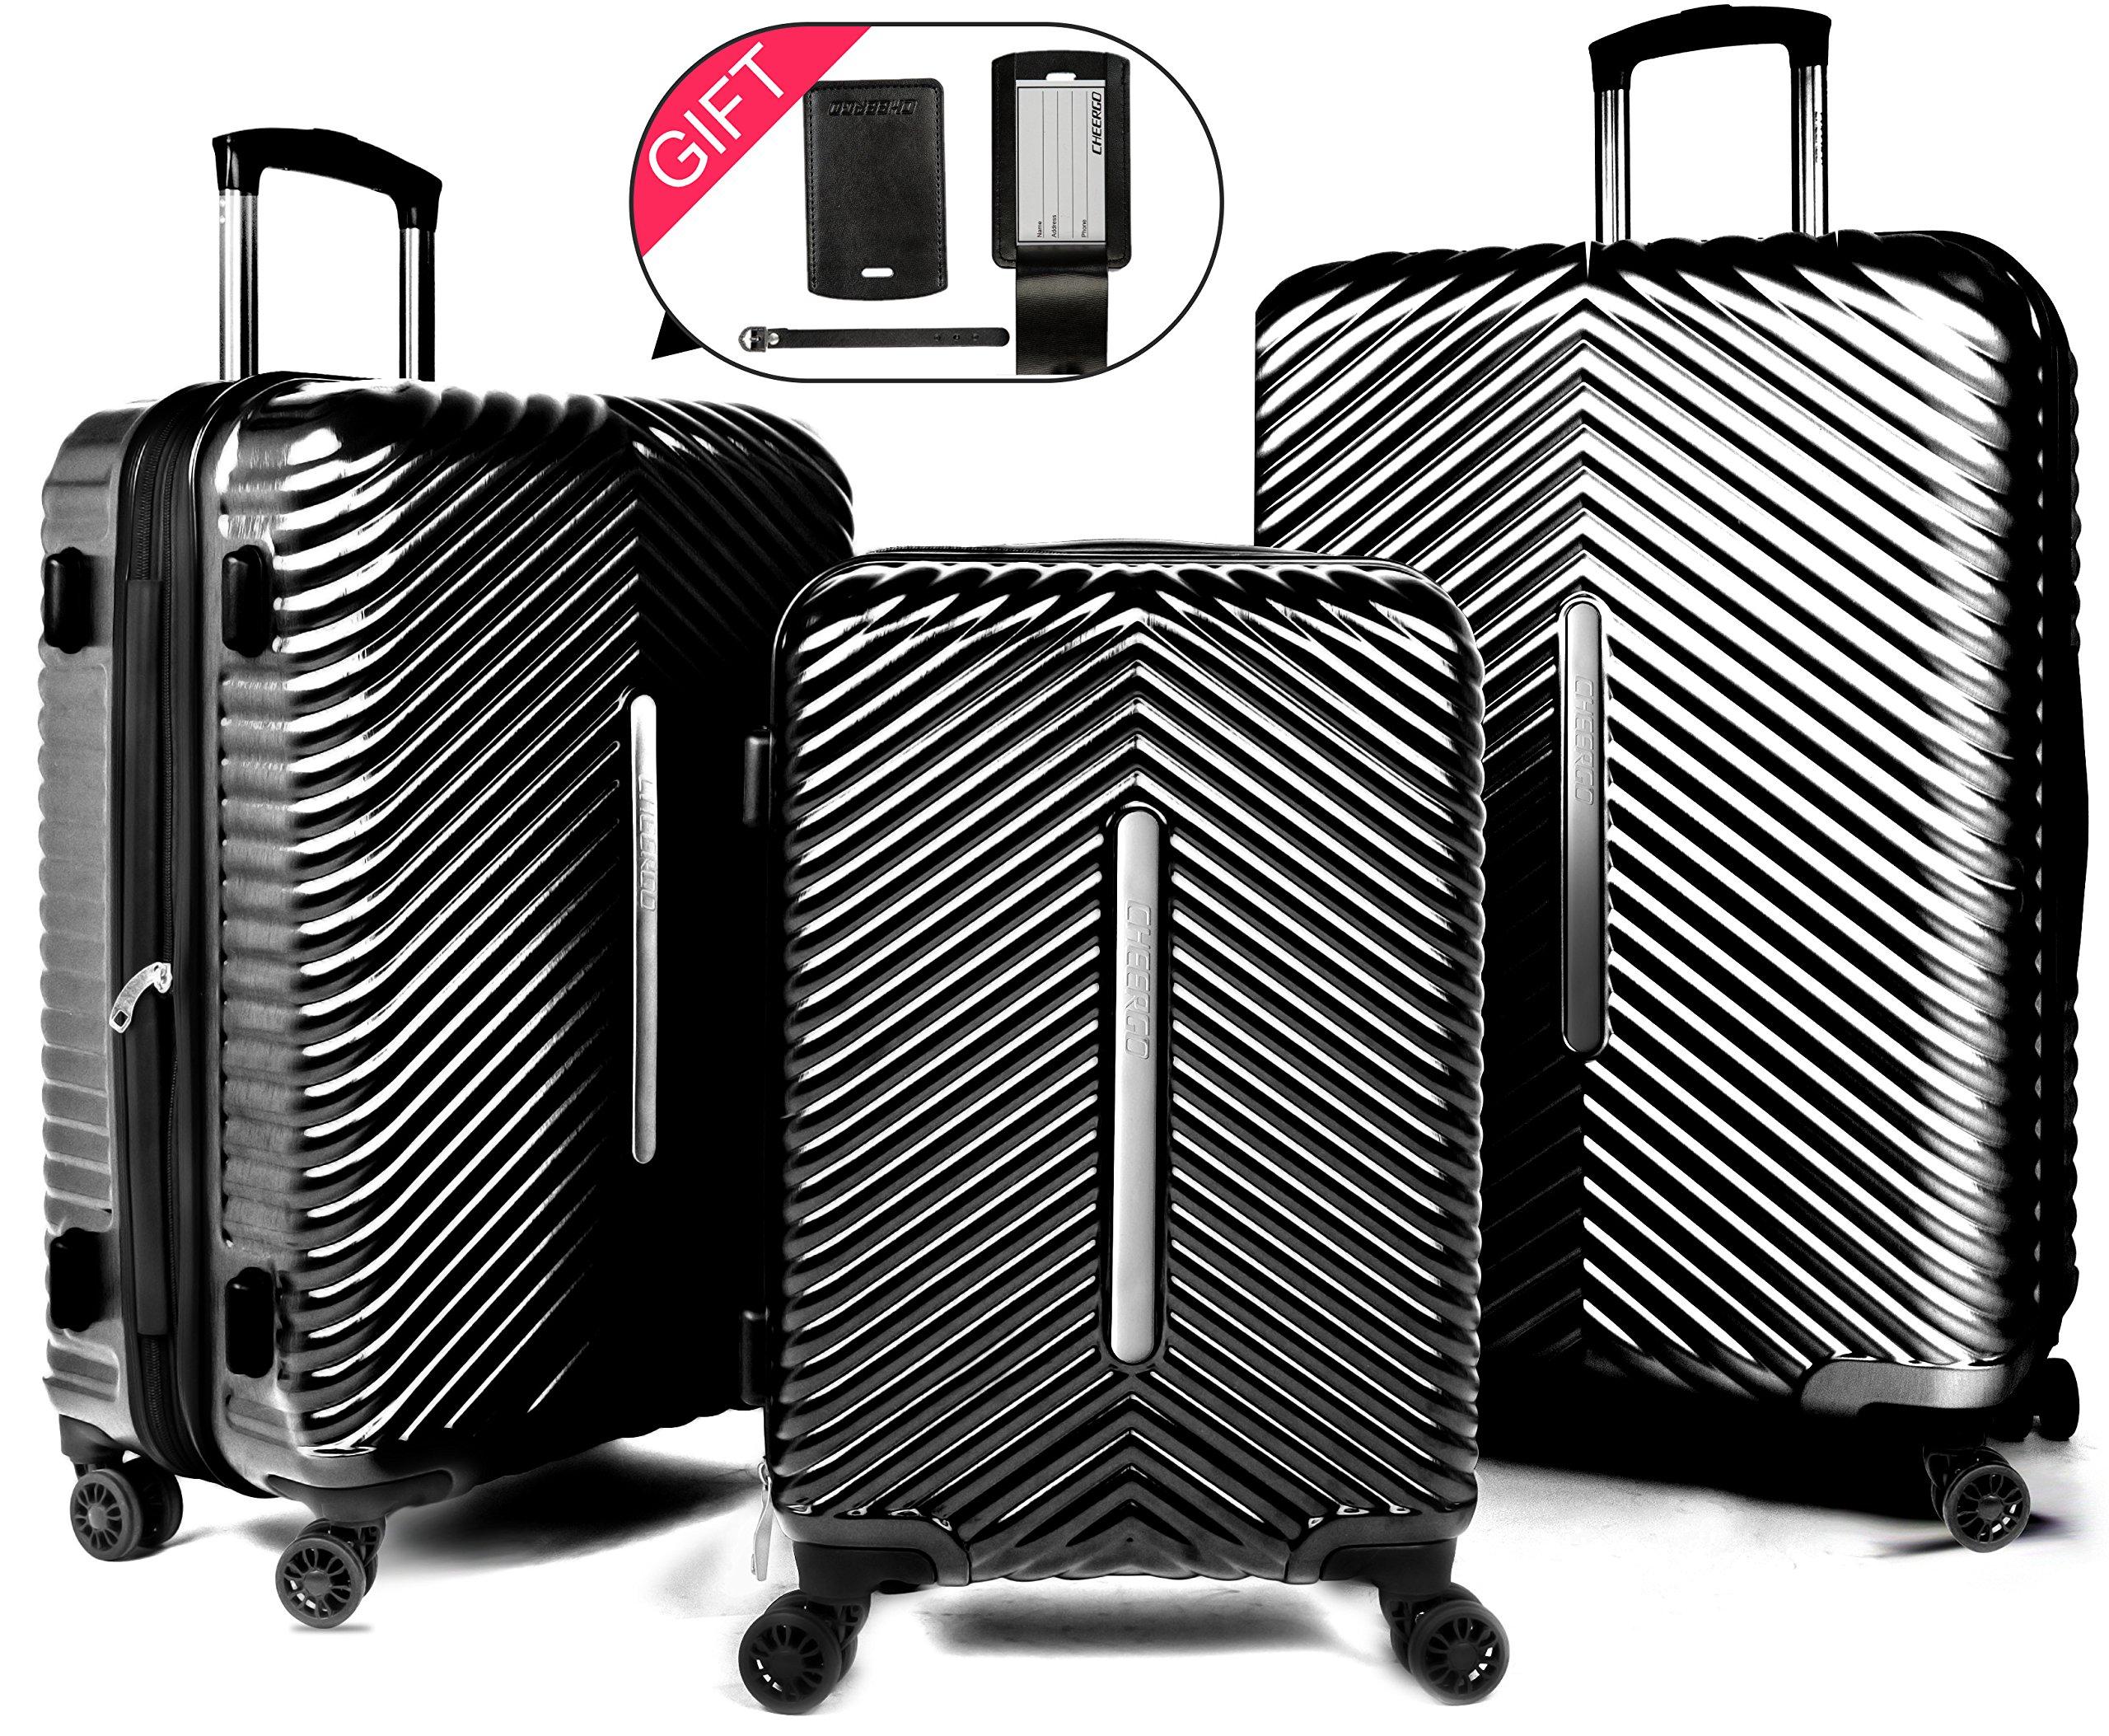 Cheergo PC 3 Piece Hardside Suitcase Luggage Set Expandable Spinner Trolley TSA Lock 20 24 28 inch Black